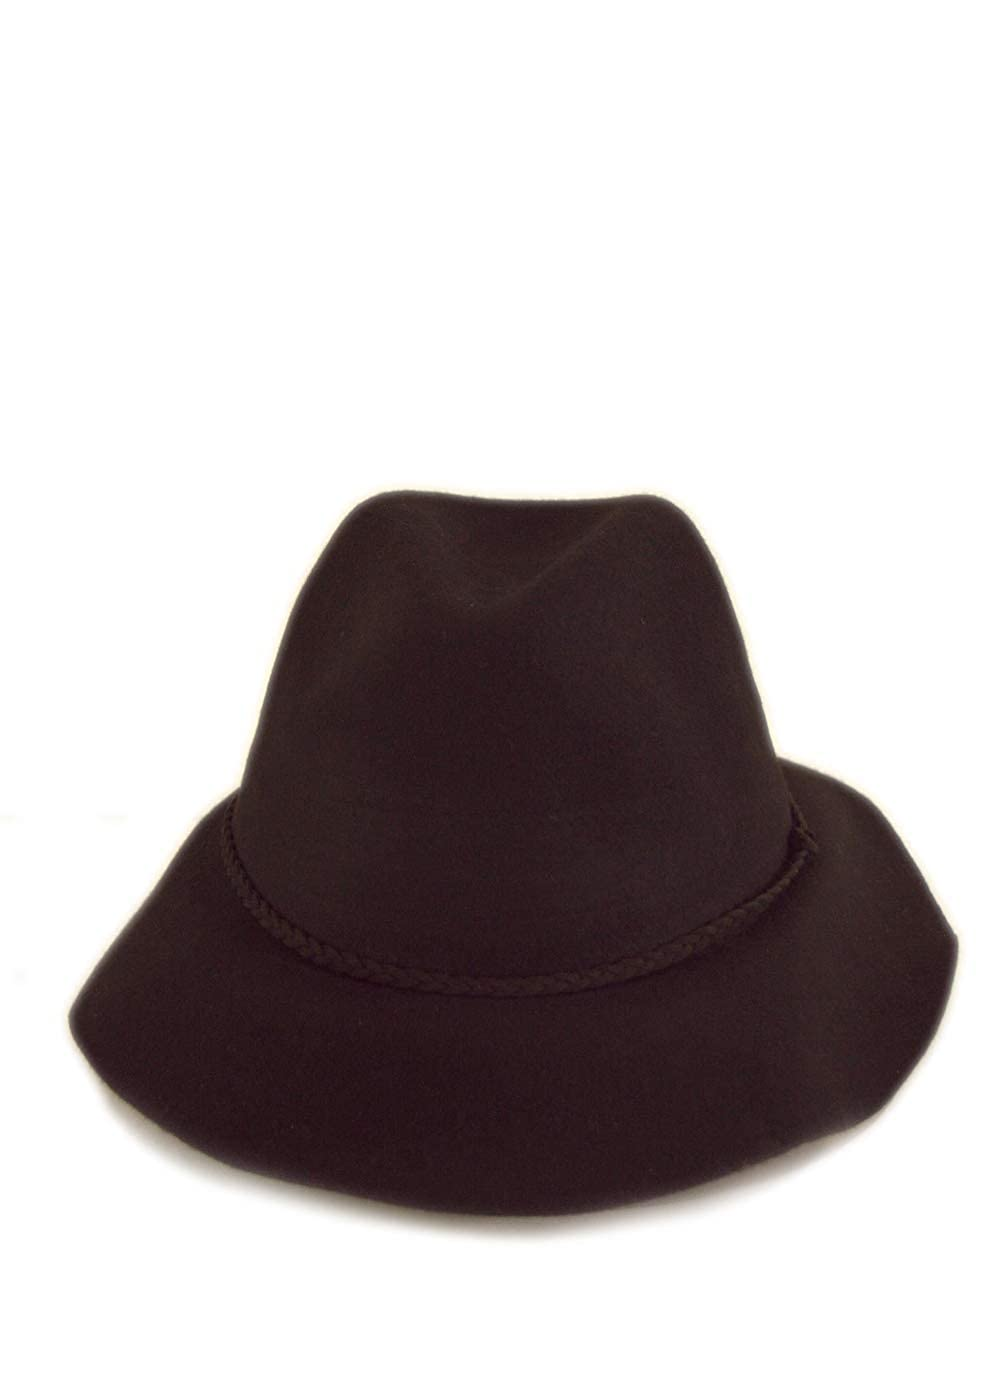 Lovedusts Womens 100/% Wool Felt Cloche Short Brim Floppy Fedora Hat with Gift